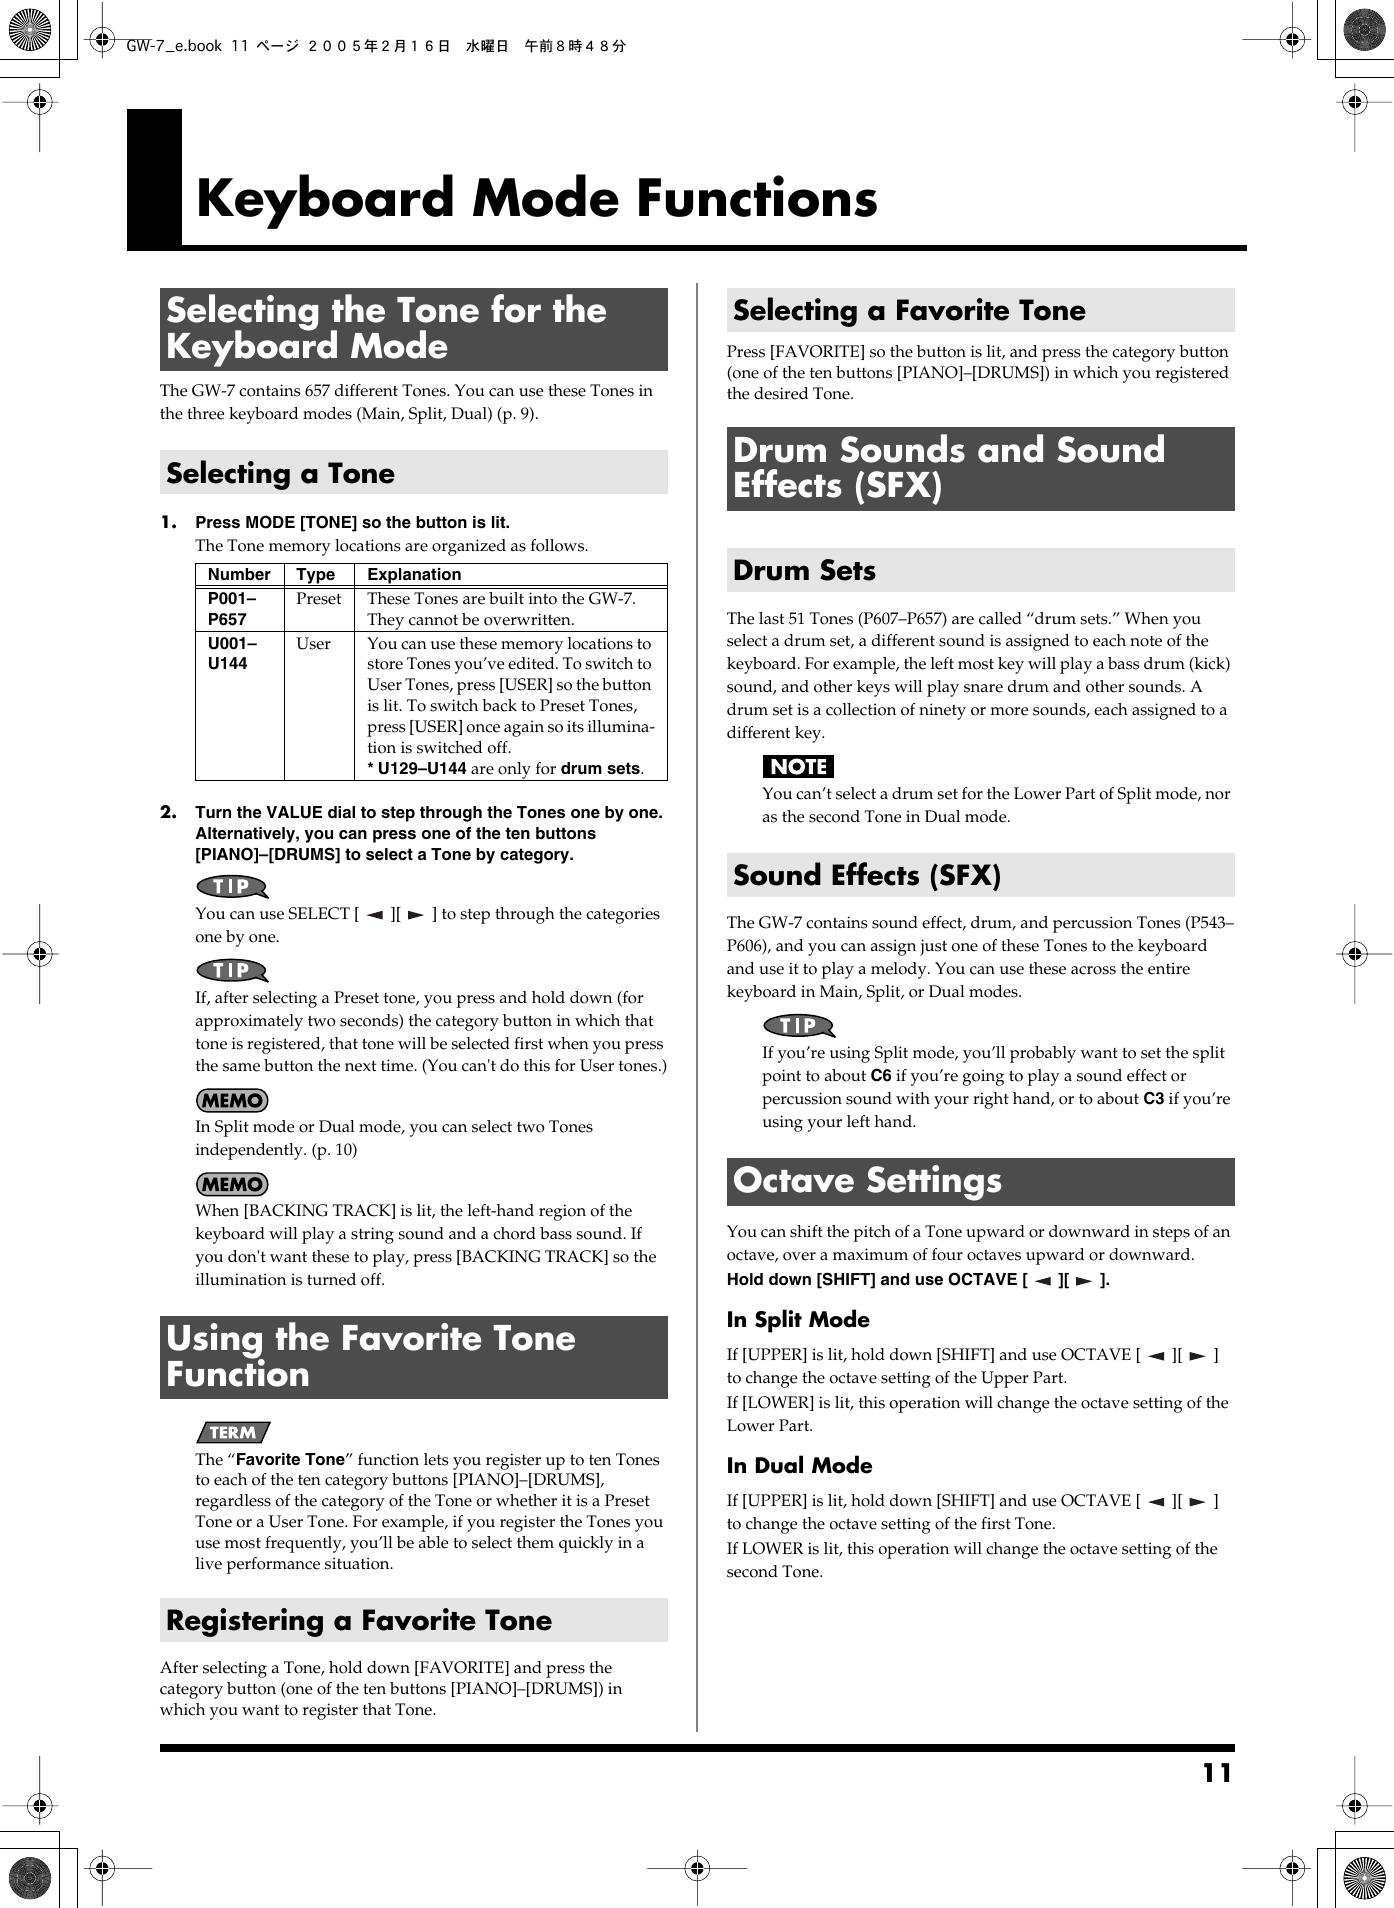 Roland Gw 7 Users Manual 7_e